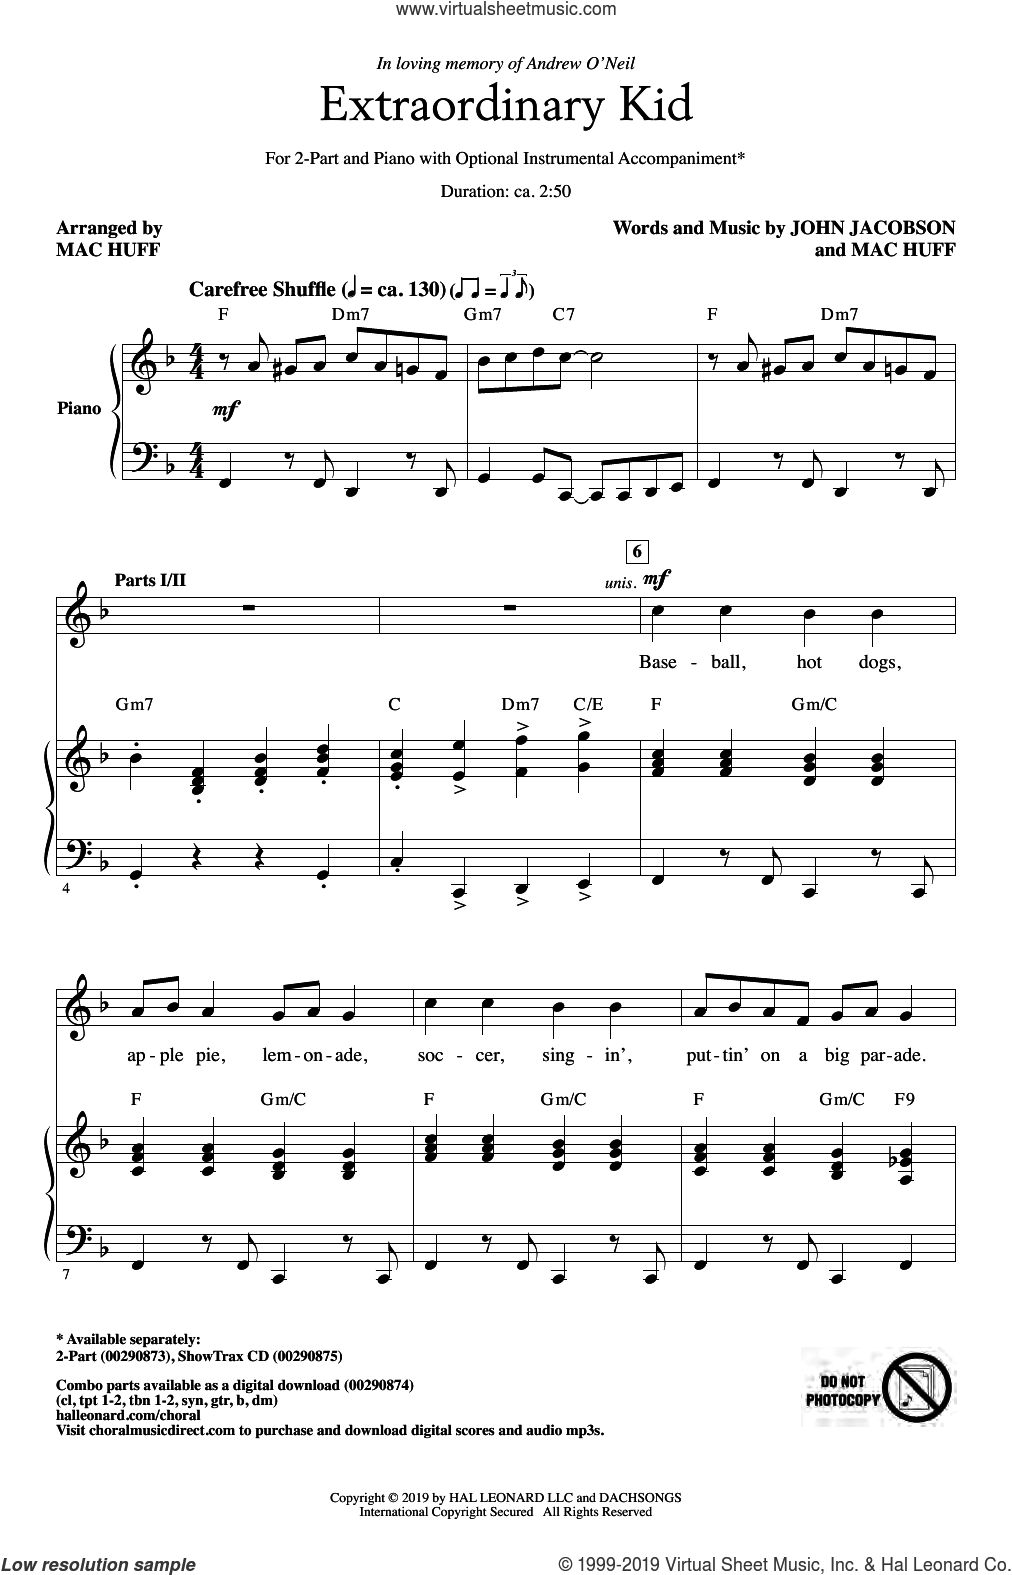 Extraordinary Kid sheet music for choir (2-Part) by Mac Huff, John Jacobson and John Jacobson & Mac Huff, intermediate duet